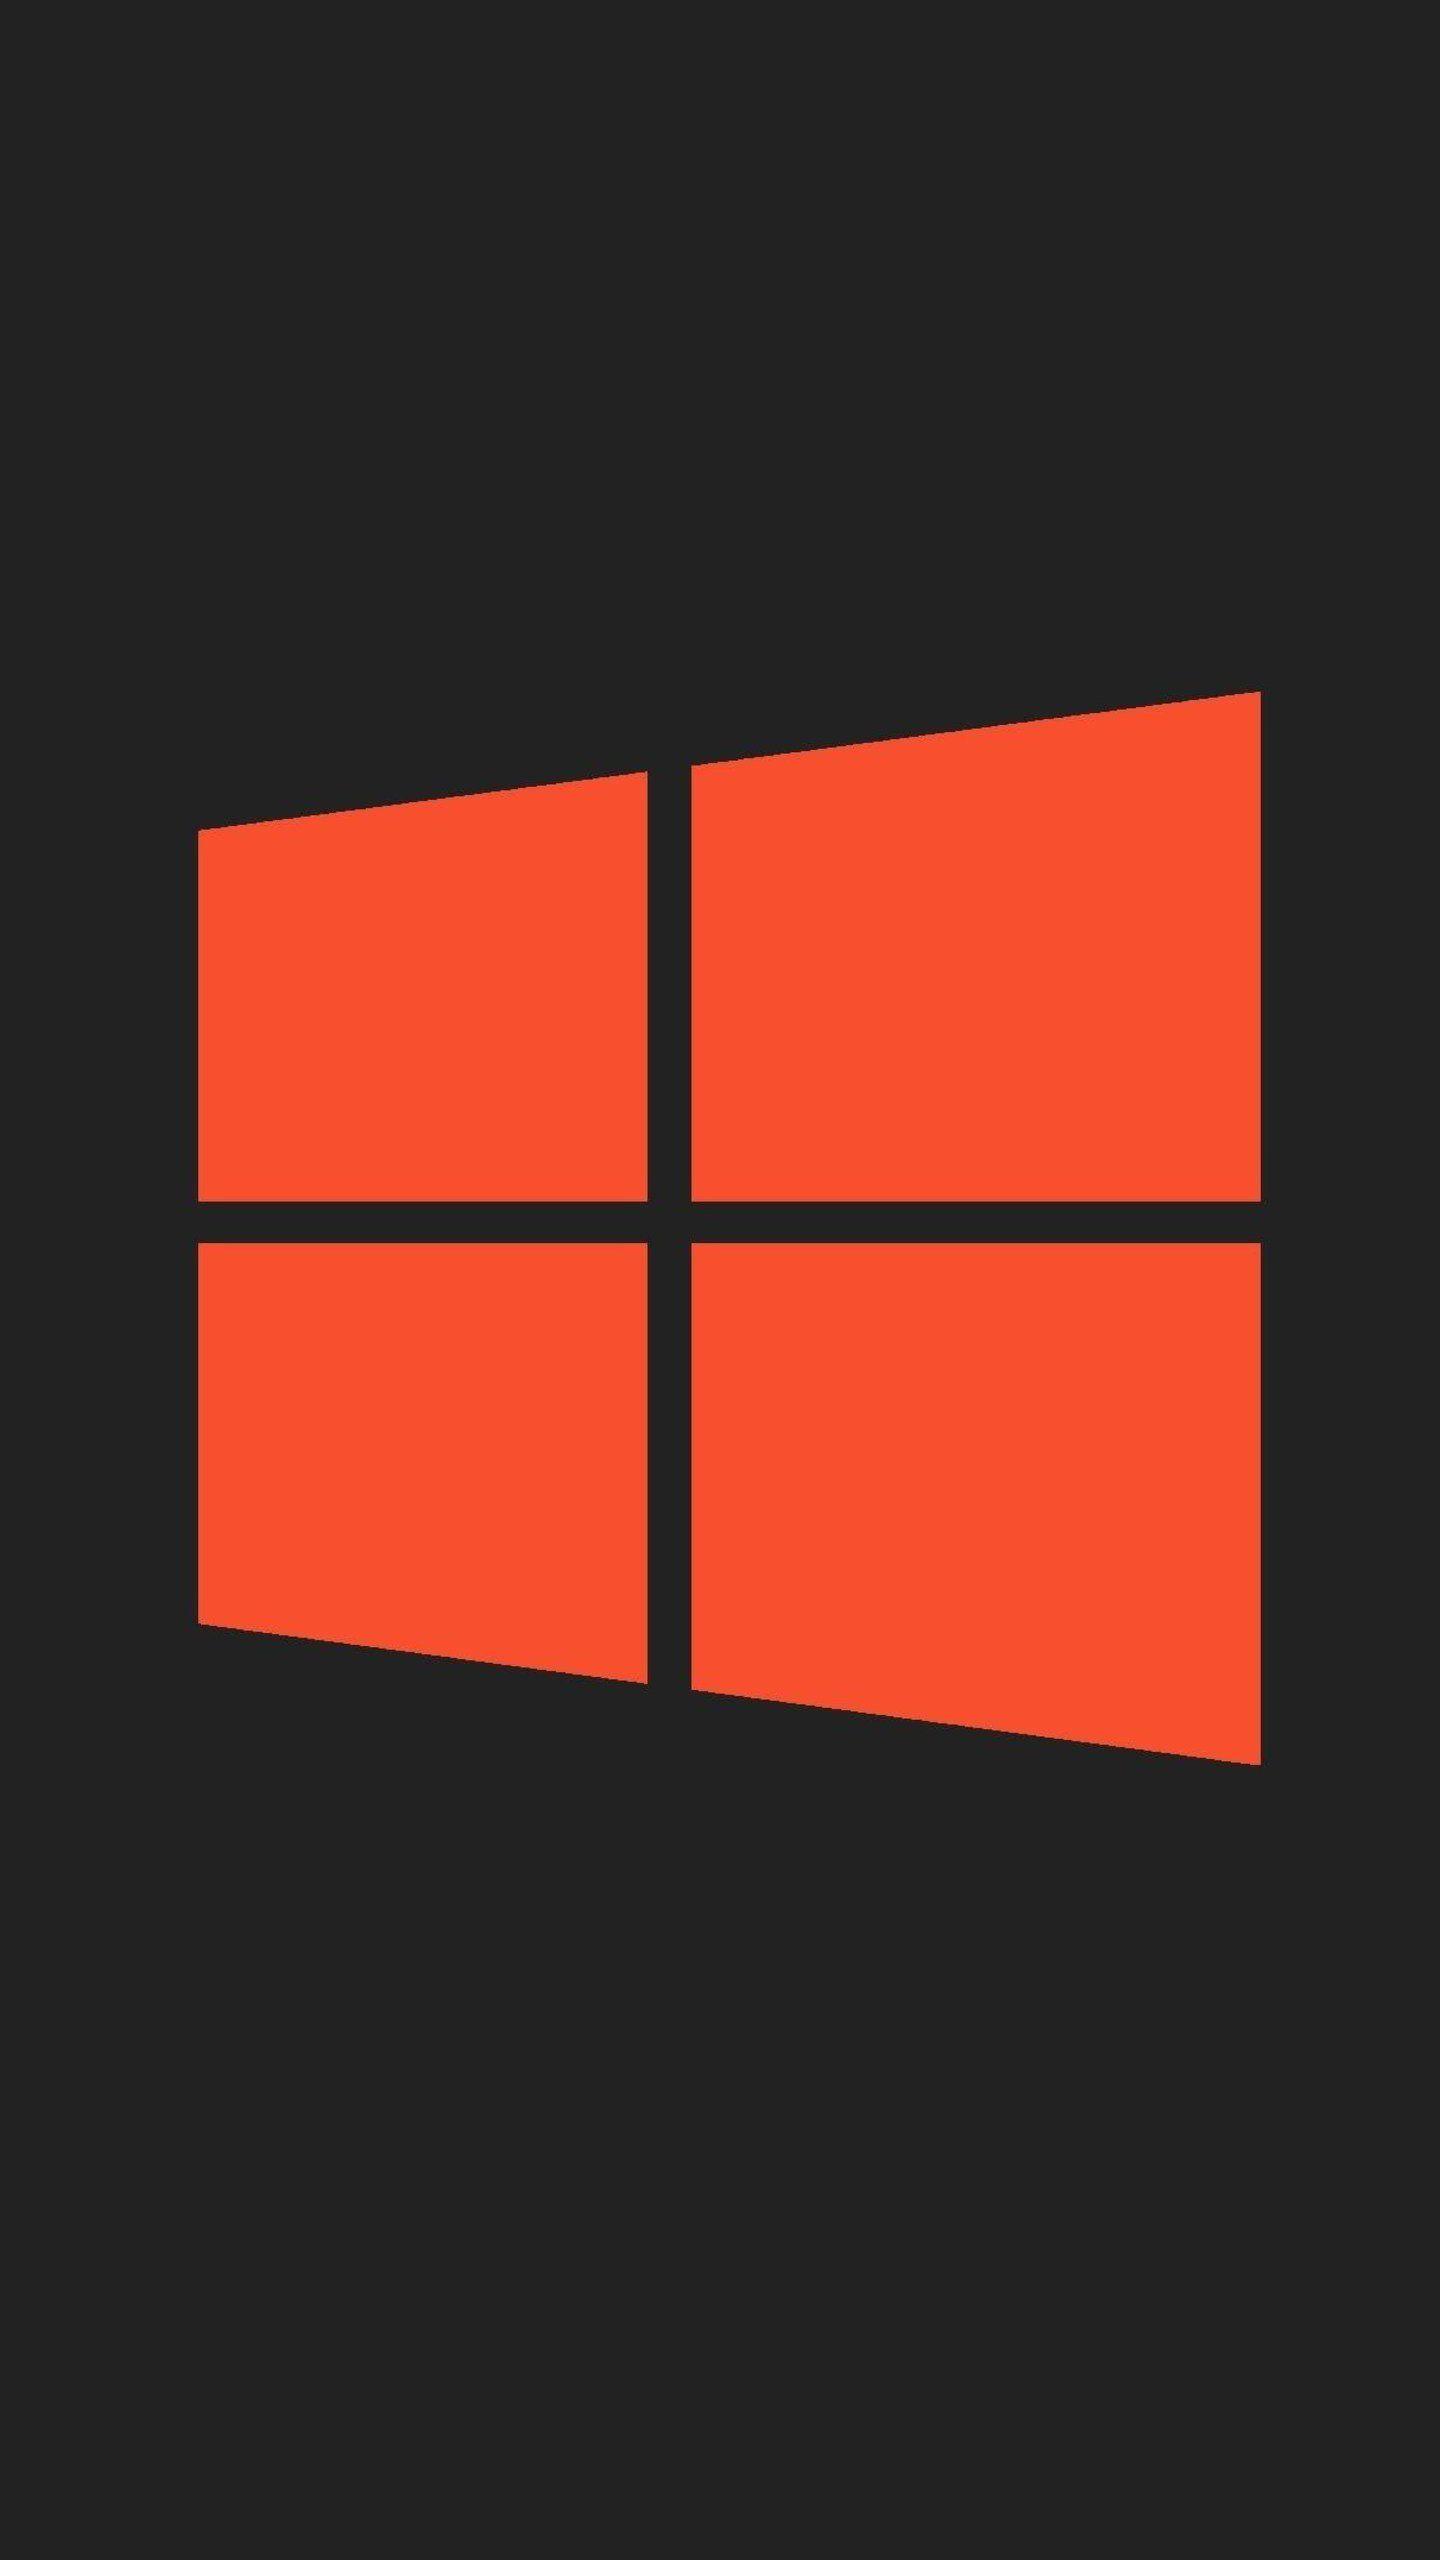 Windows 10 Orange Stock Hd Computer Wallpapers Photos And Pictures Computer Wallpaper S8 Wallpaper Wallpaper Windows 10